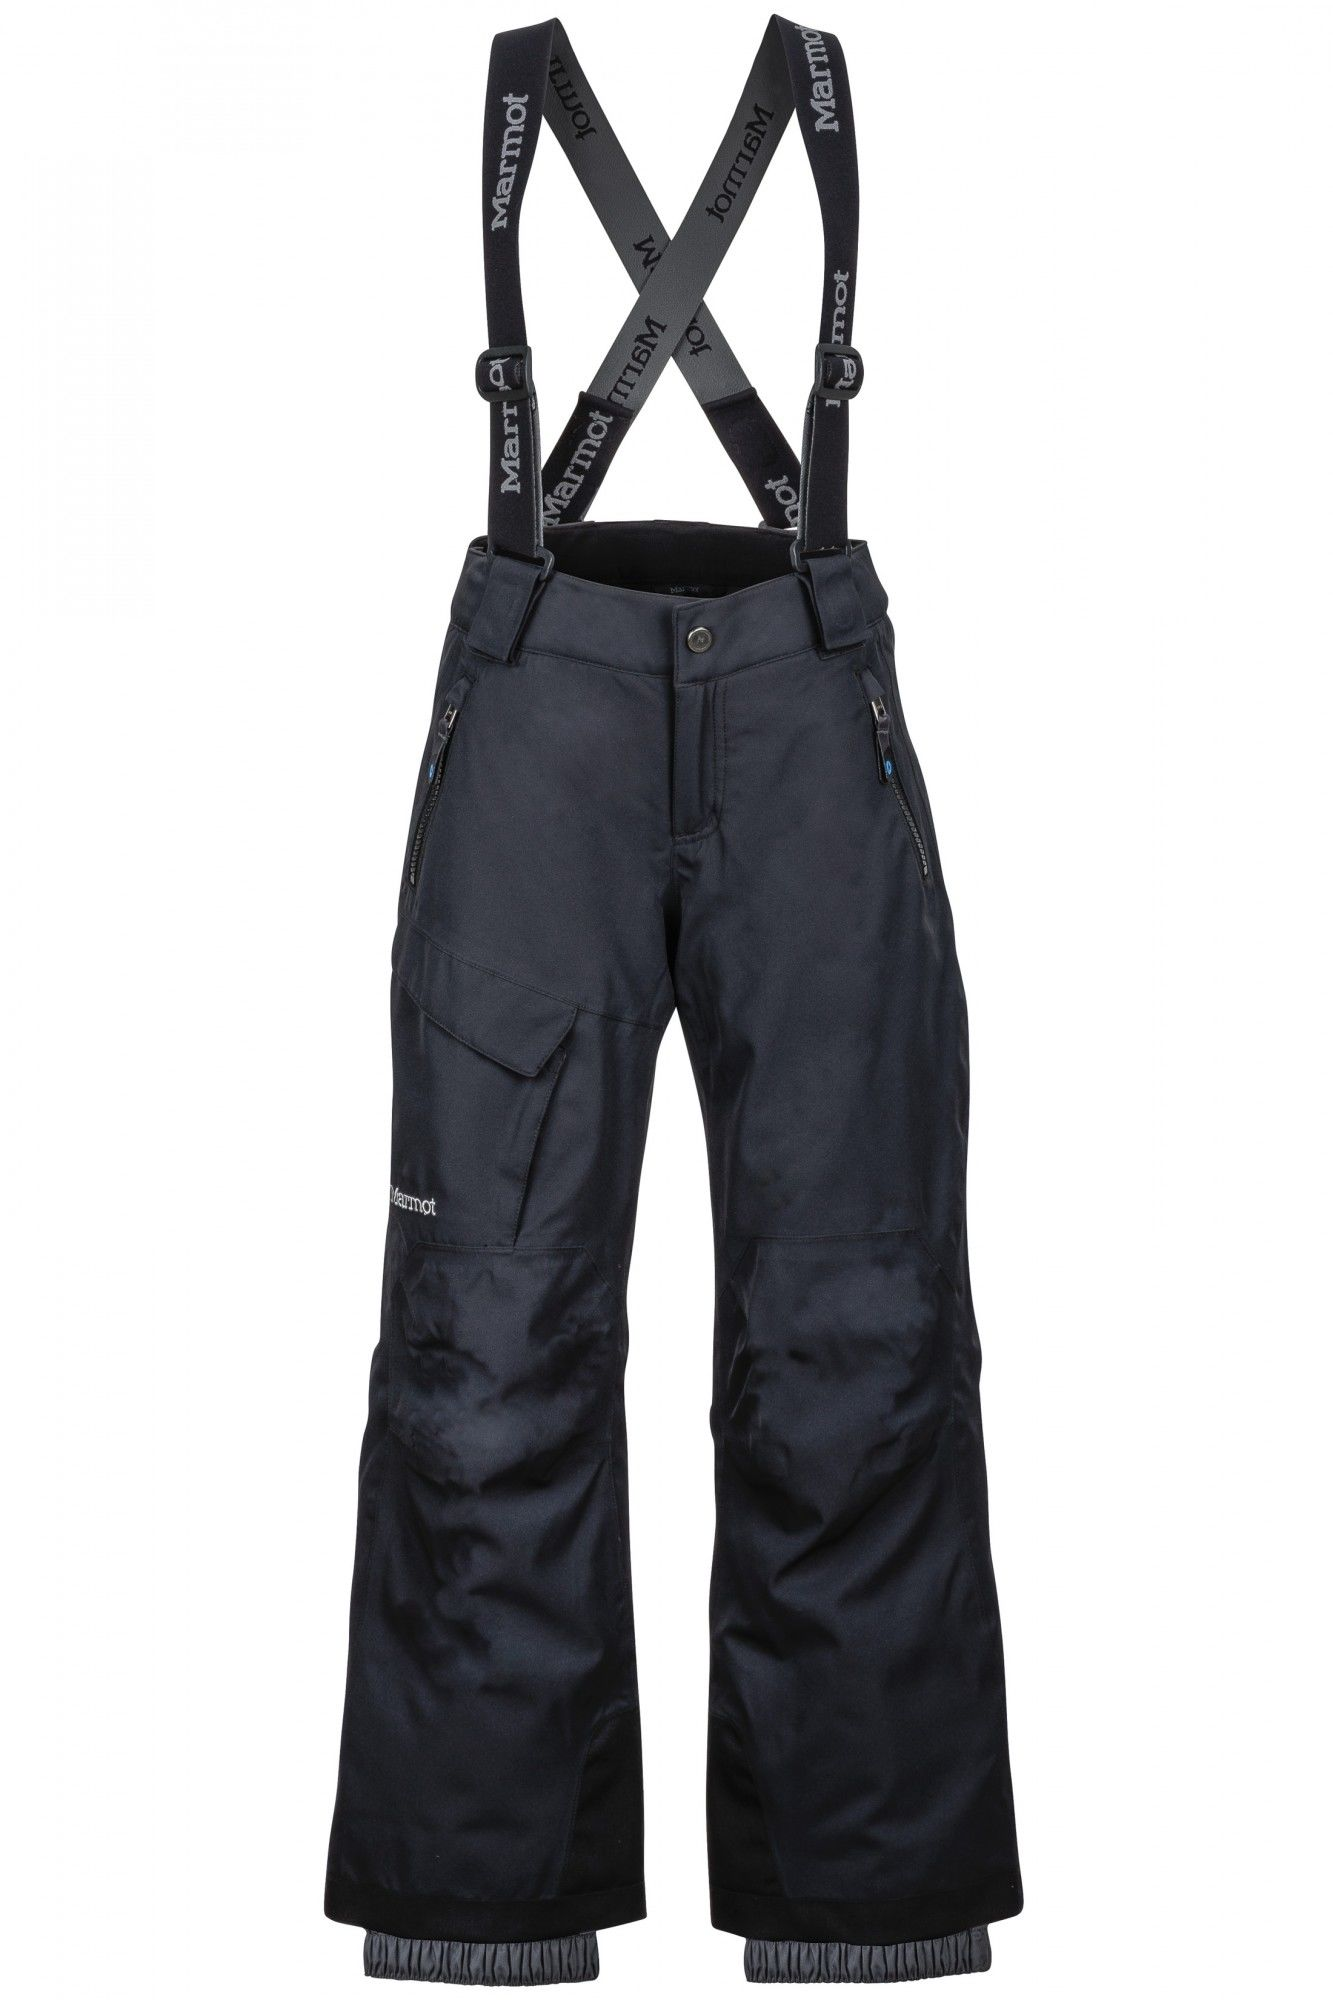 Marmot Boys Edge Insulated Pant Schwarz, Male S -Farbe Black, S